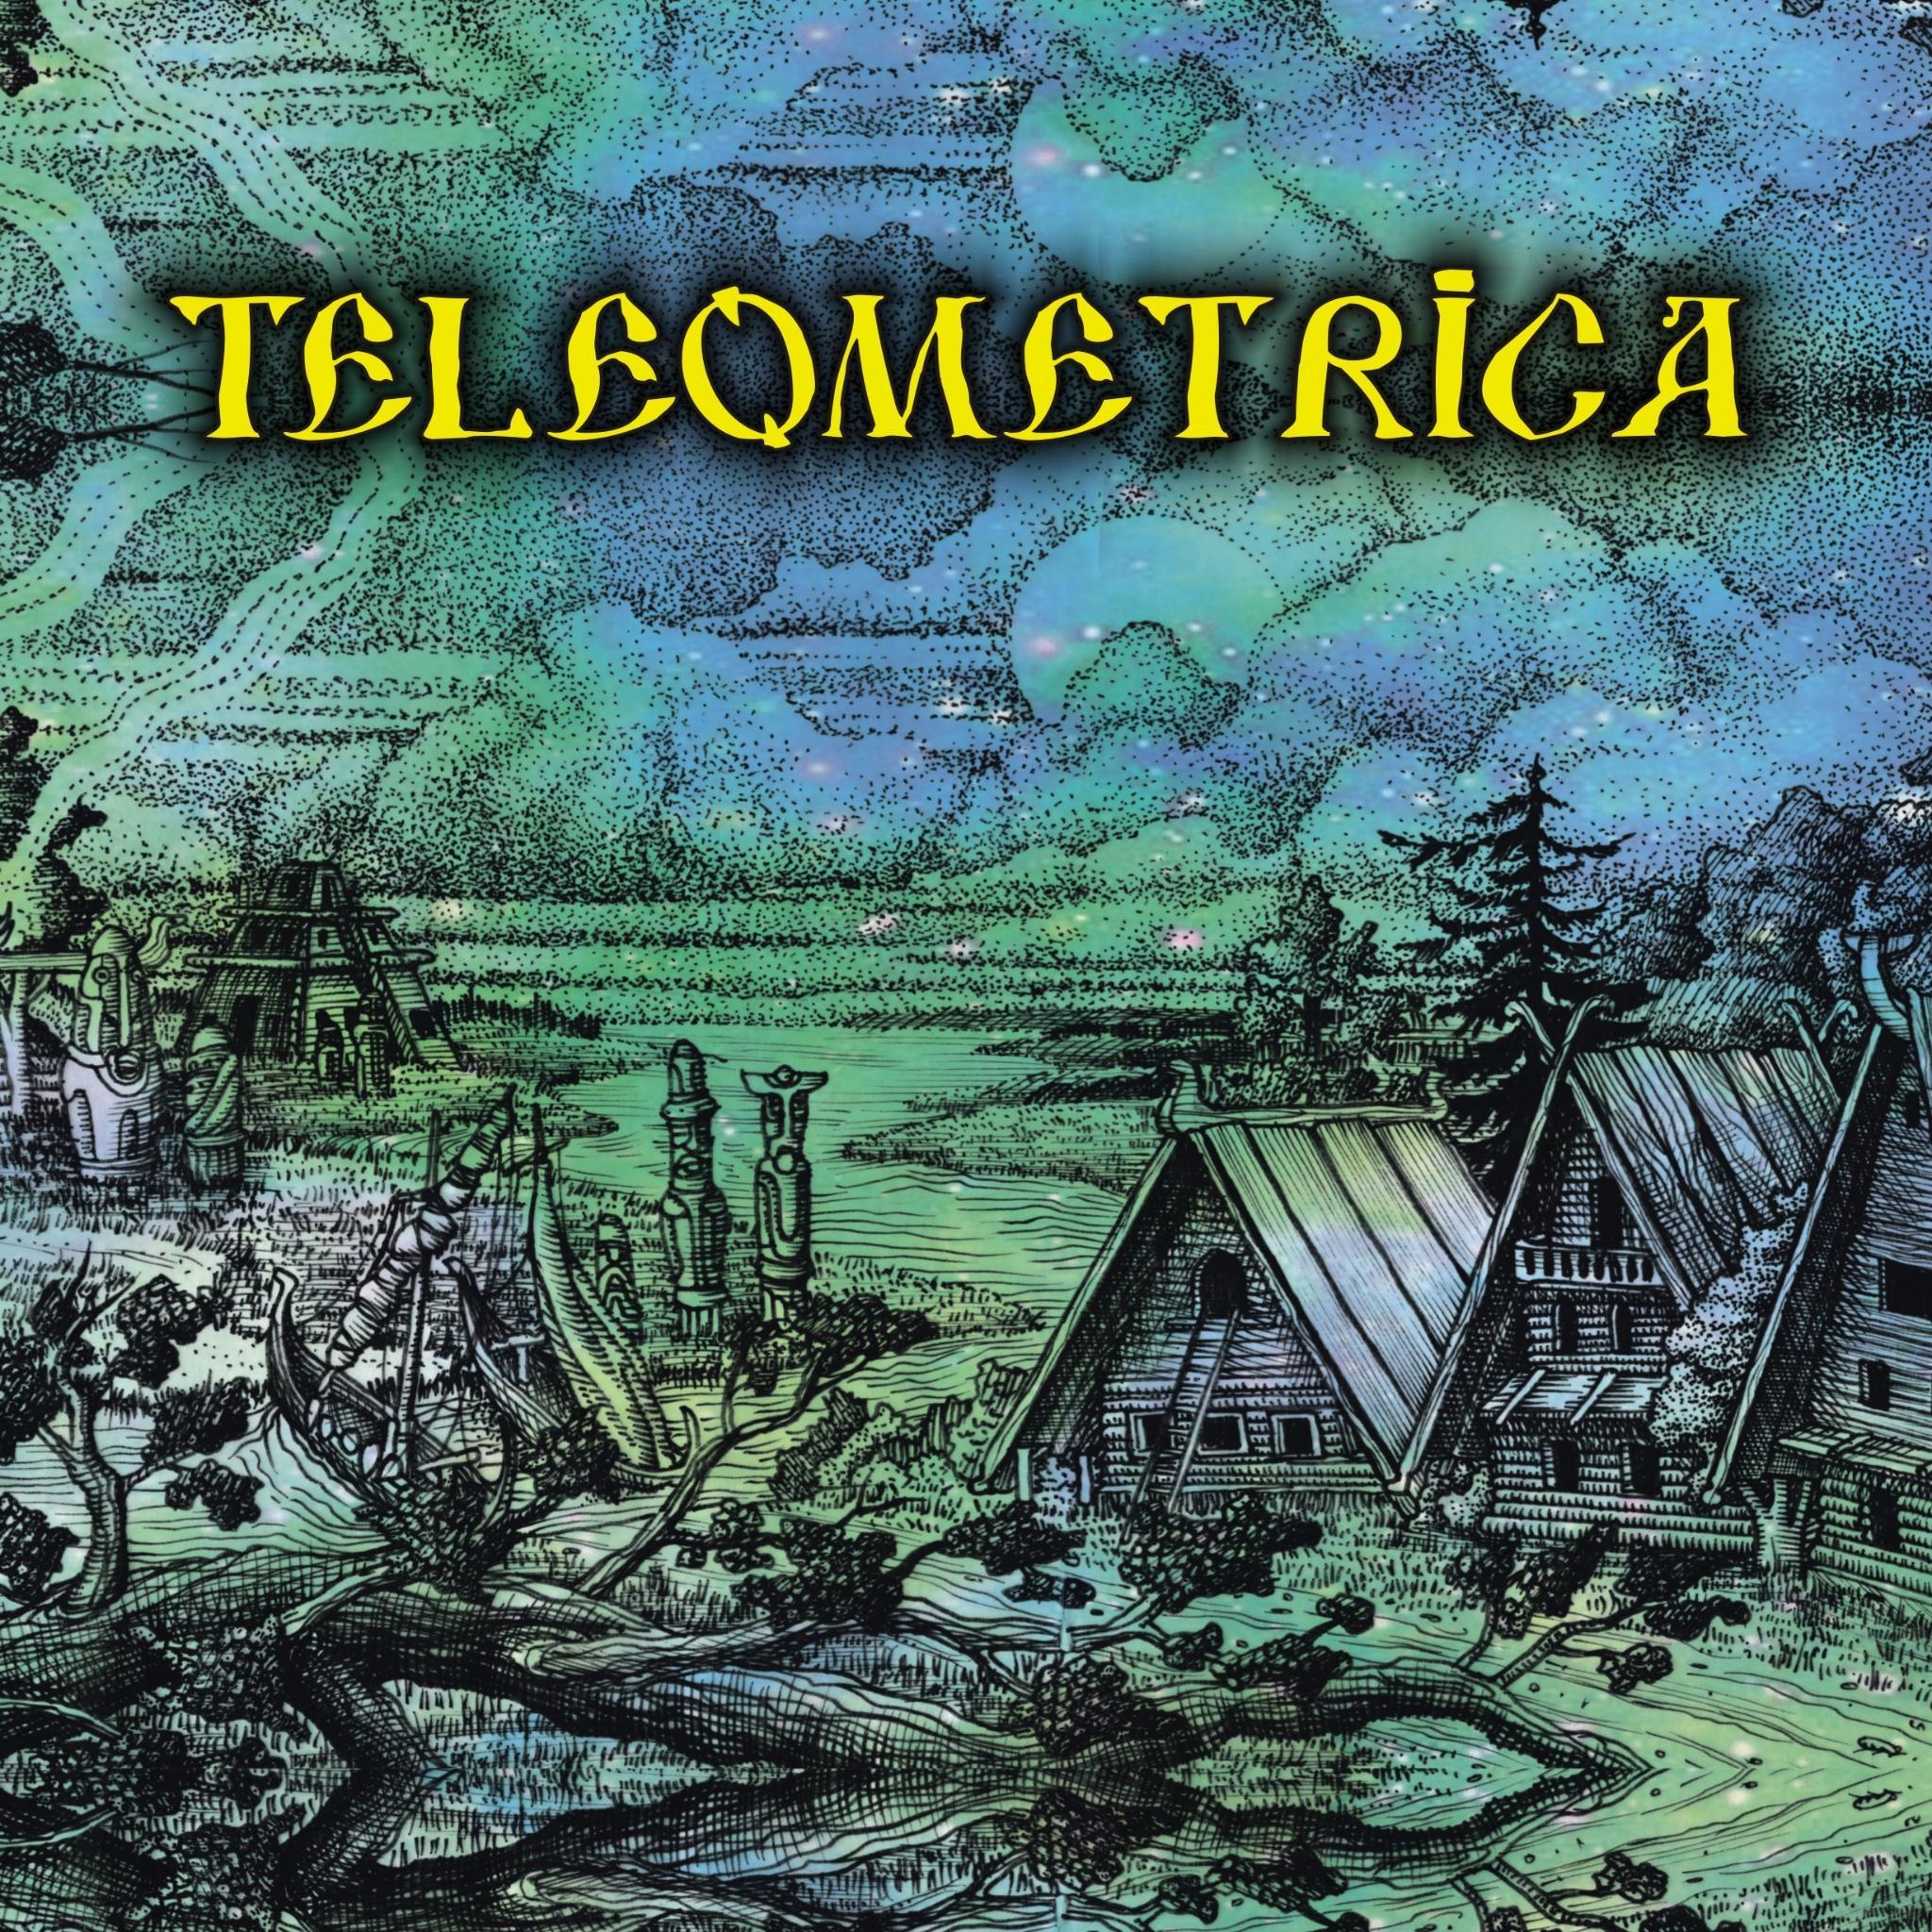 Teleometrica